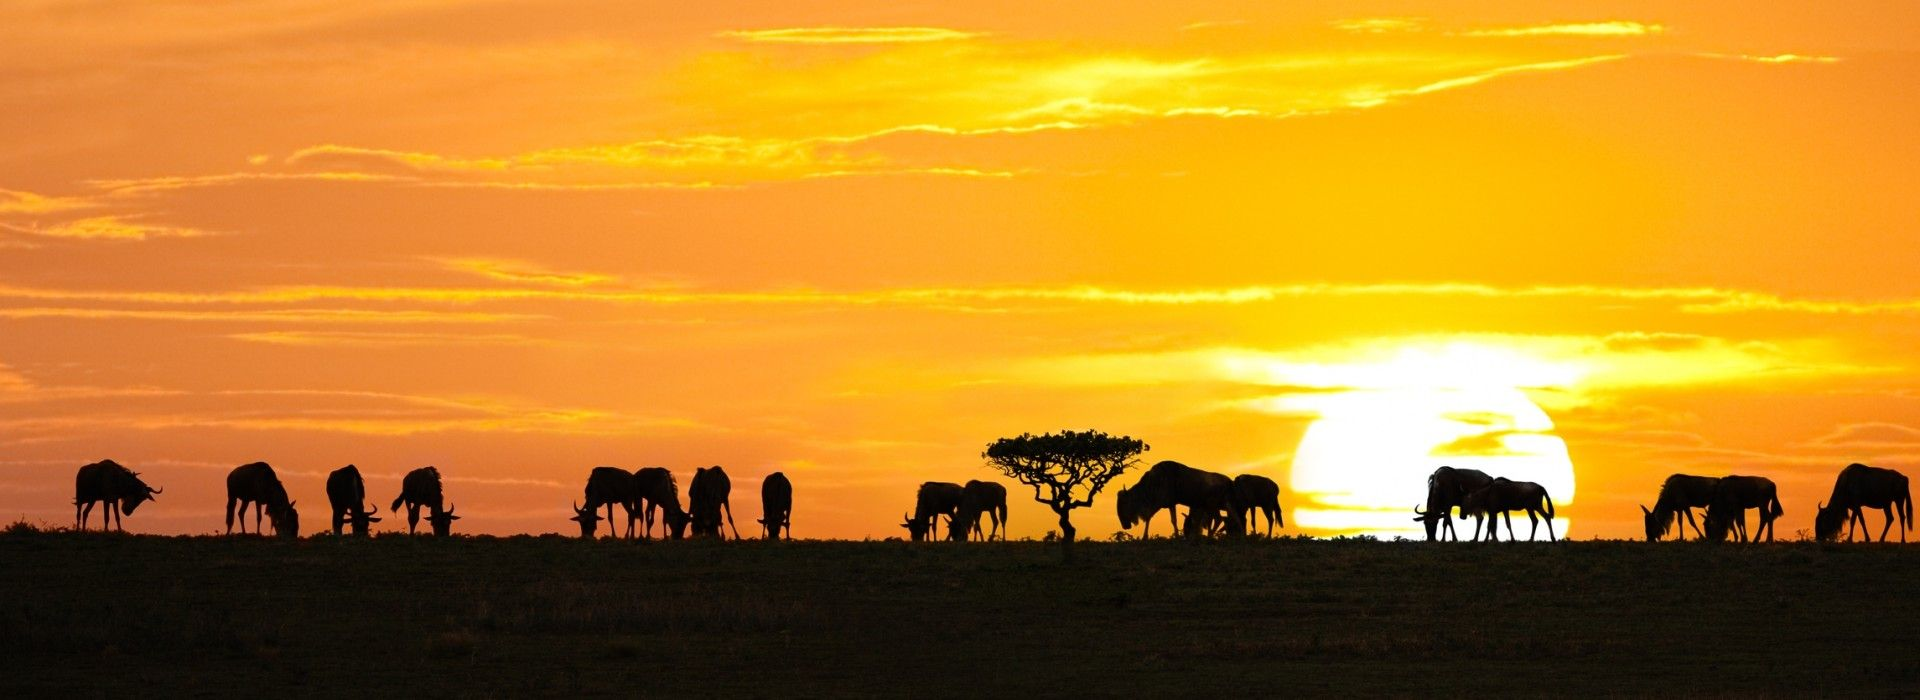 Wildlife safaris and game drives Tours in Northern Safari Circuit